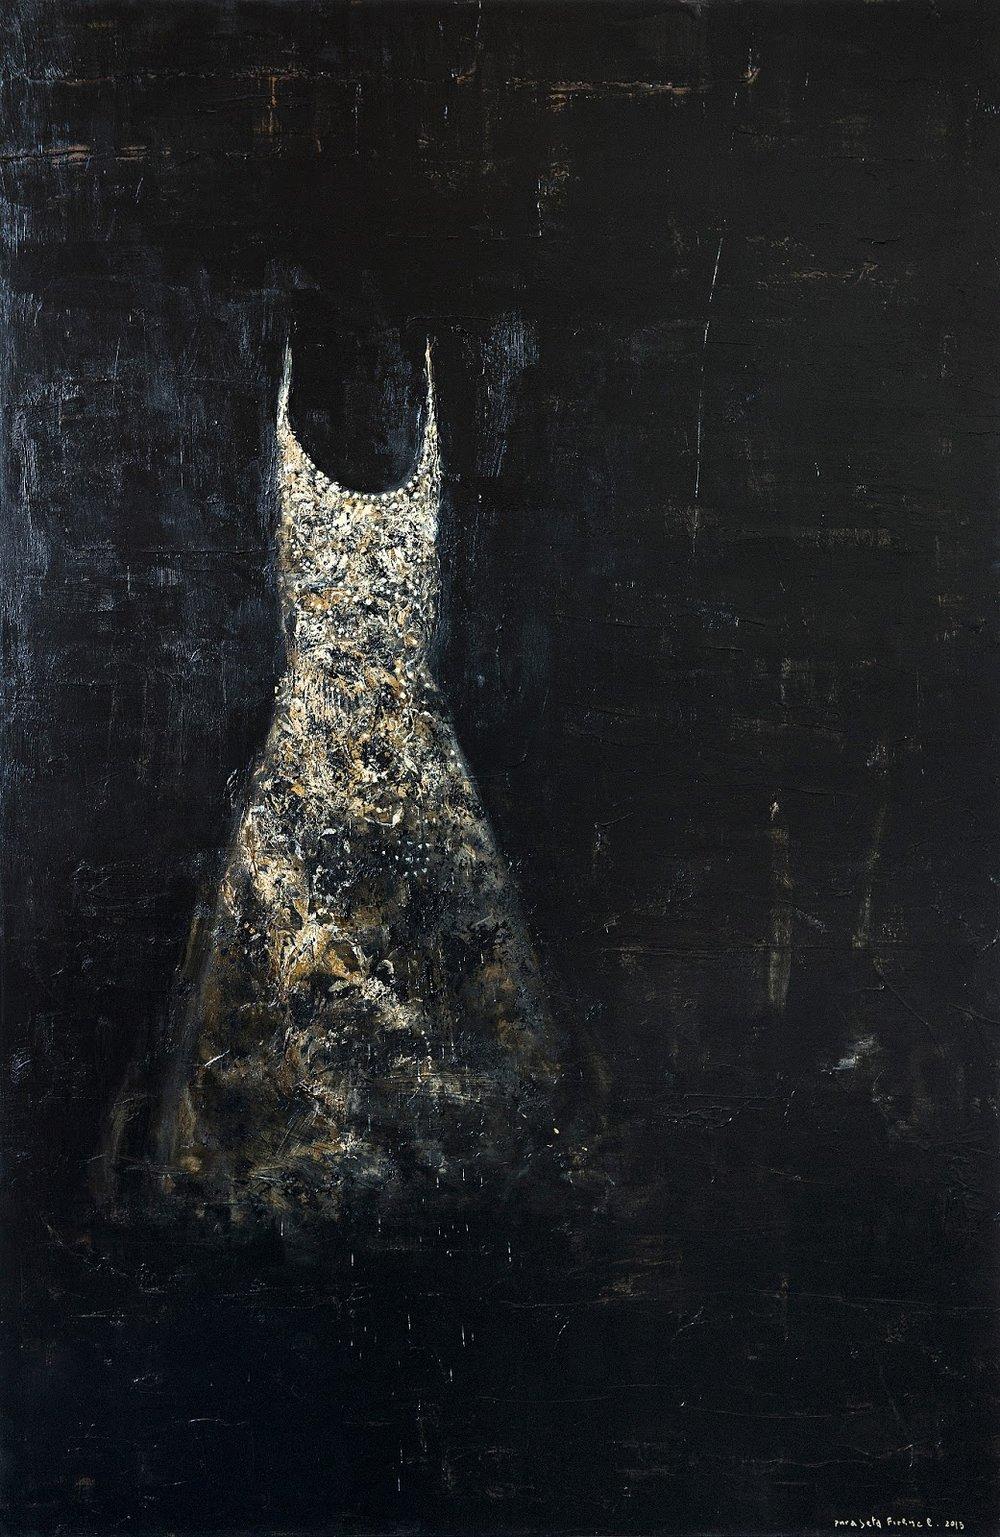 Pizzi Canella, Dresses in his studio